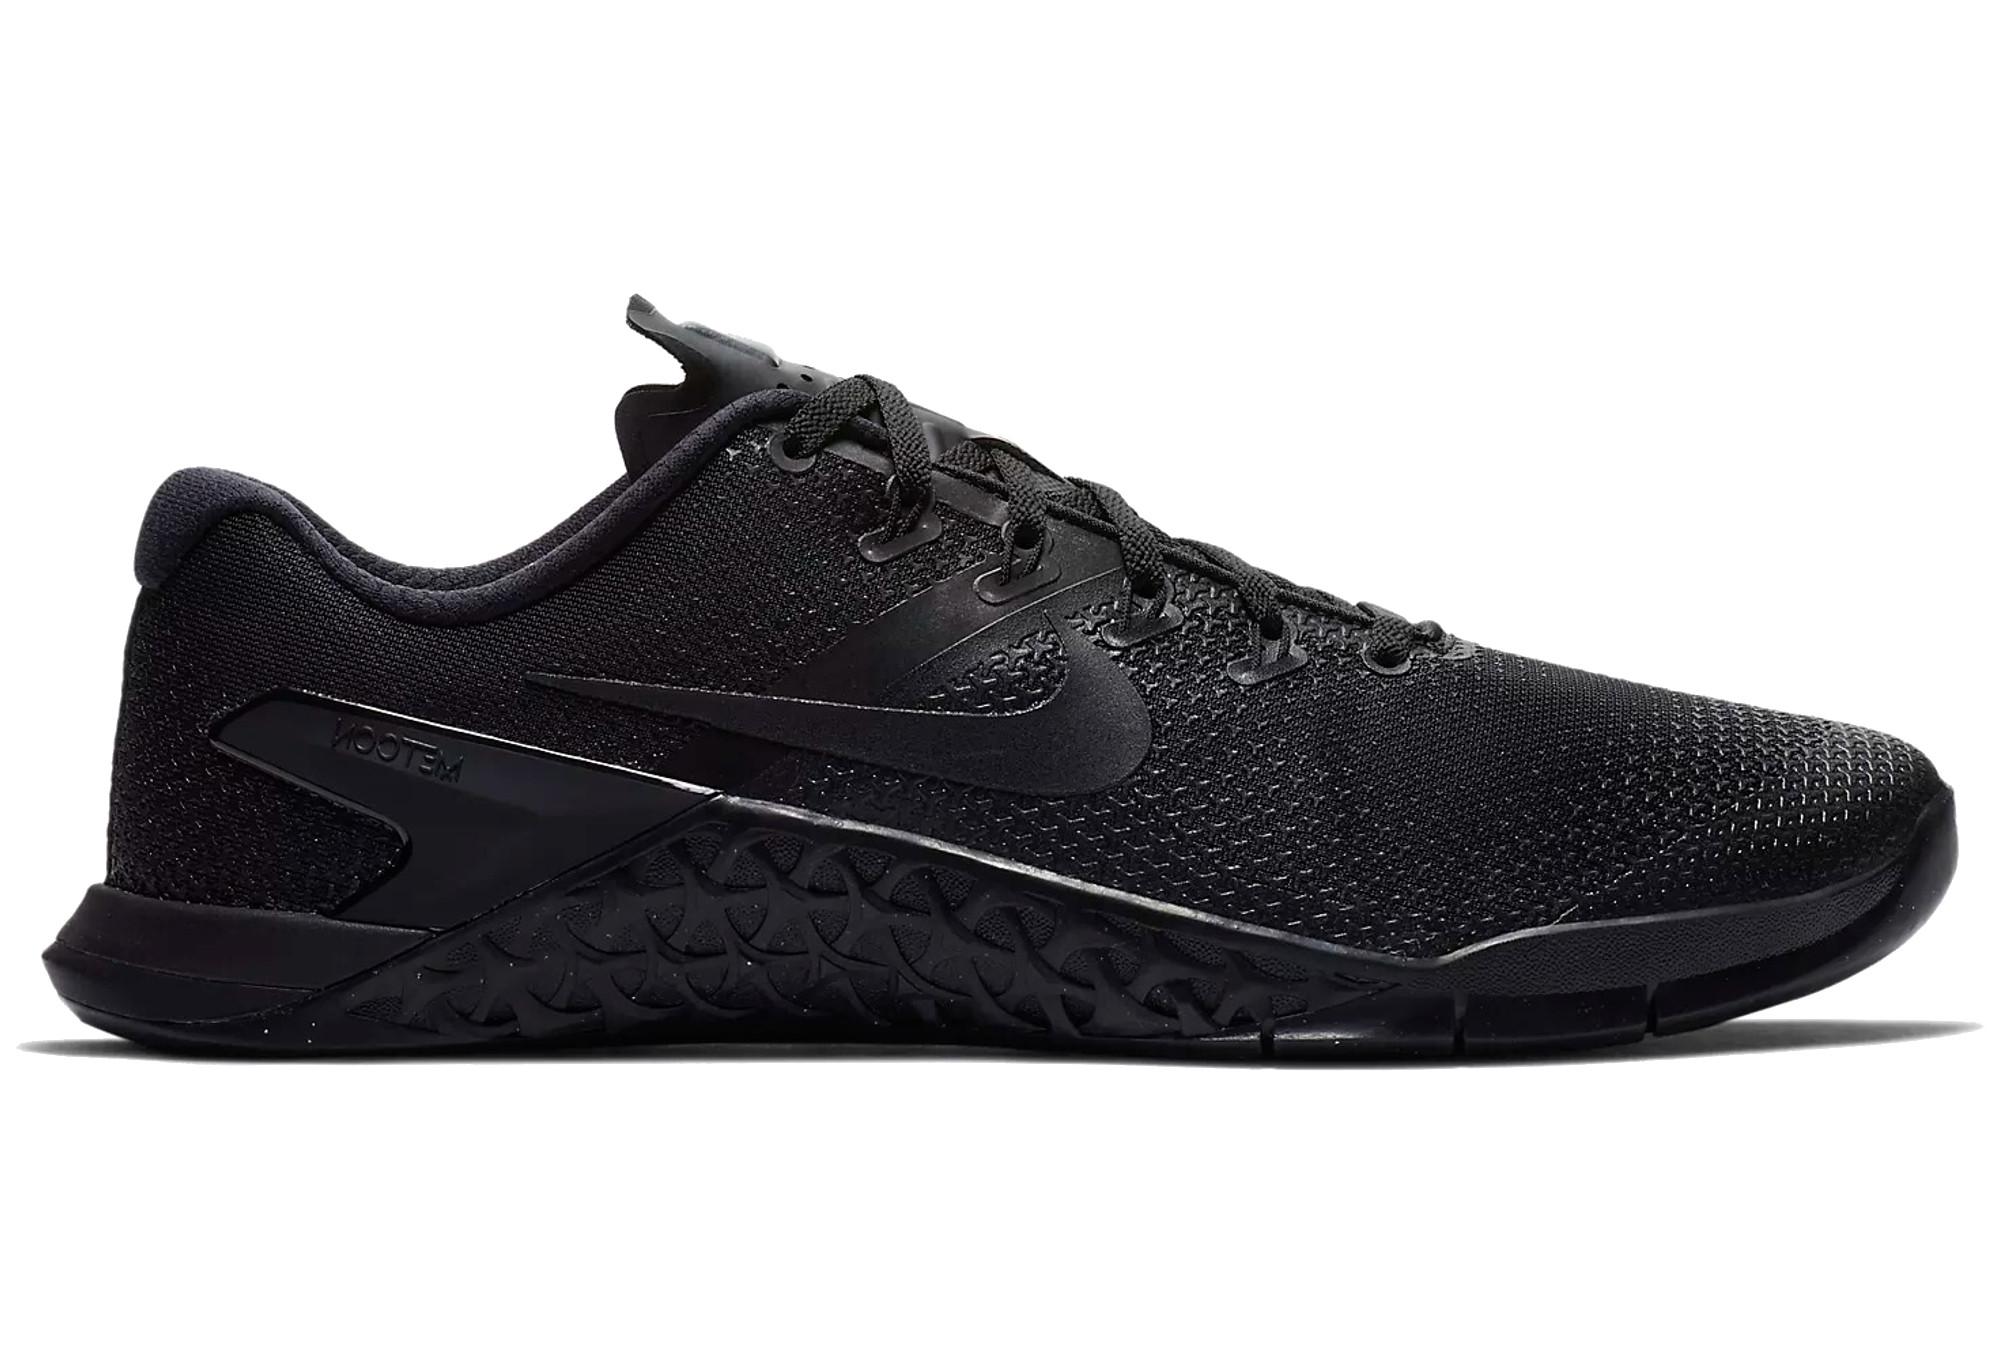 size 40 cd5df 6a4a3 Chaussures de Cross Training Nike Metcon 4 Noir   Noir